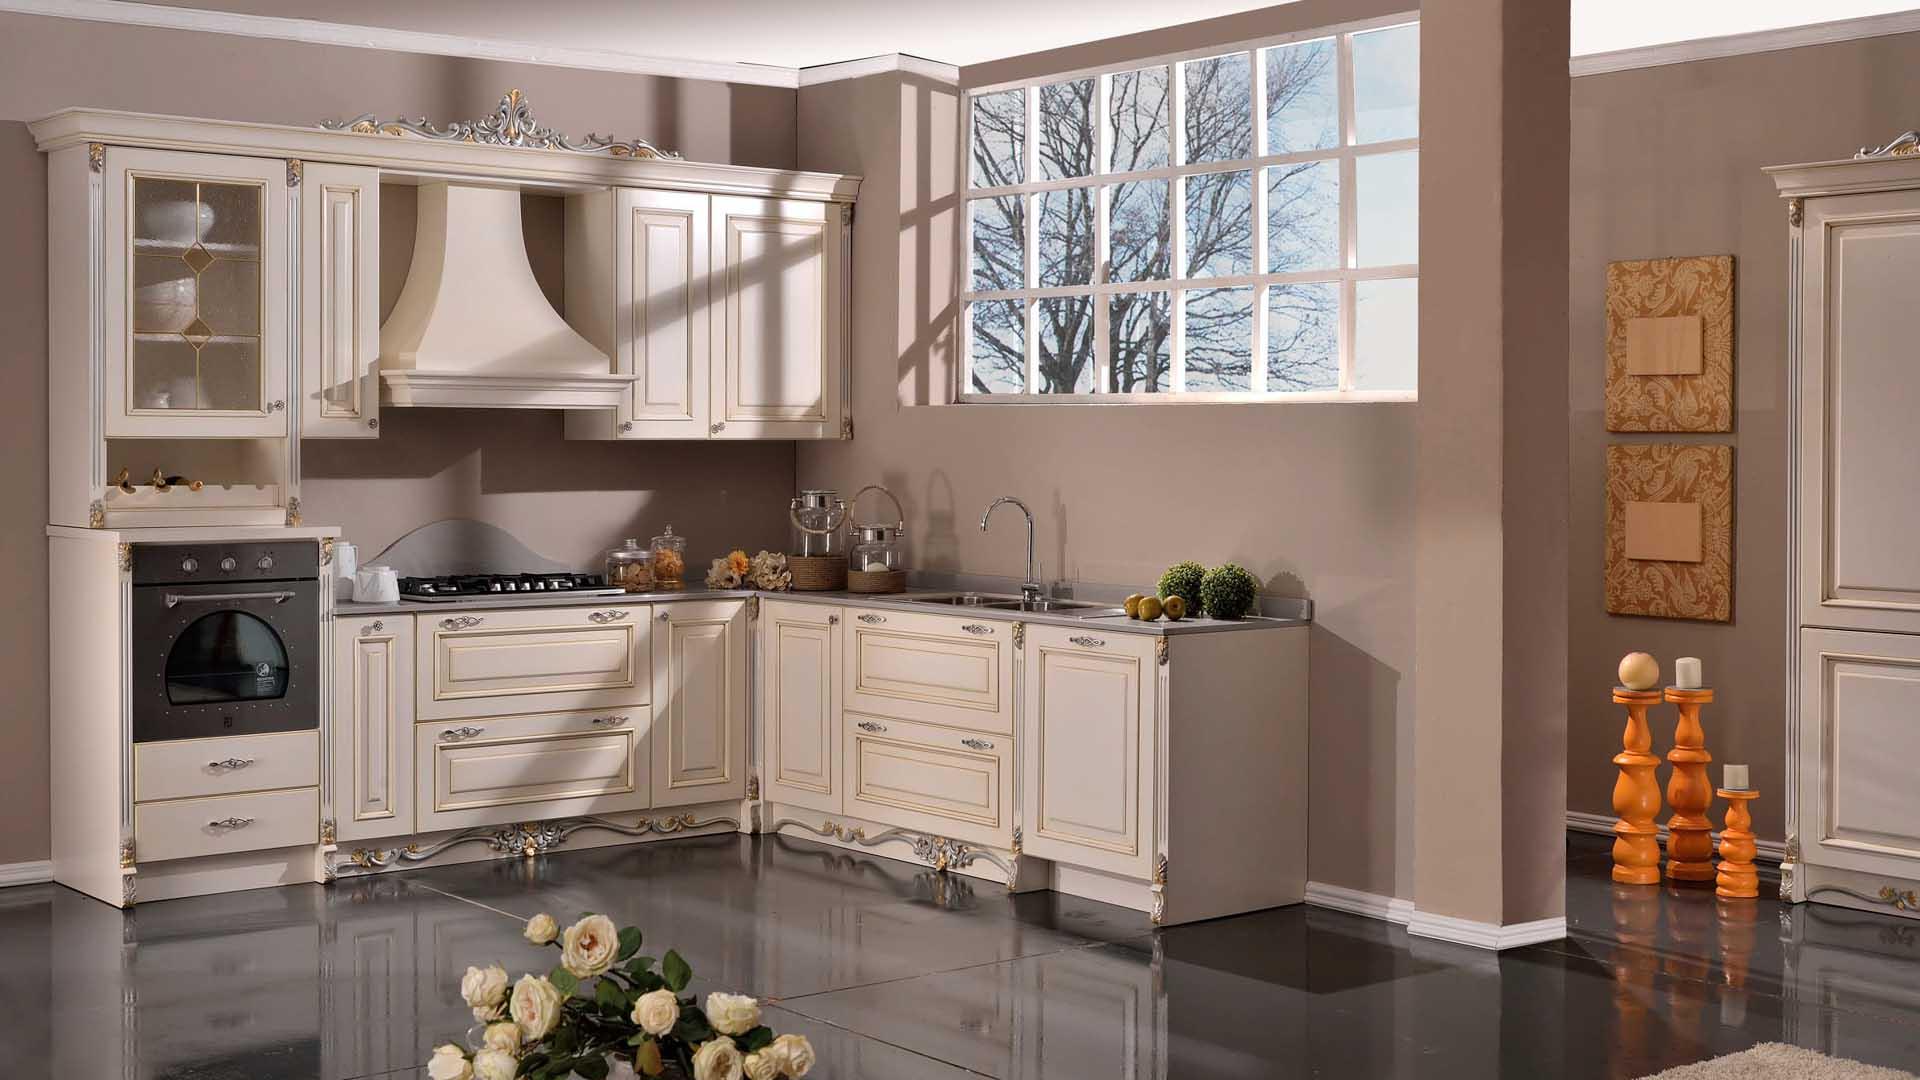 Casa arredamenti good arredamenti mobili arredamento mobilifici casa camerette tavoli armadi - Arredamenti vintage casa ...